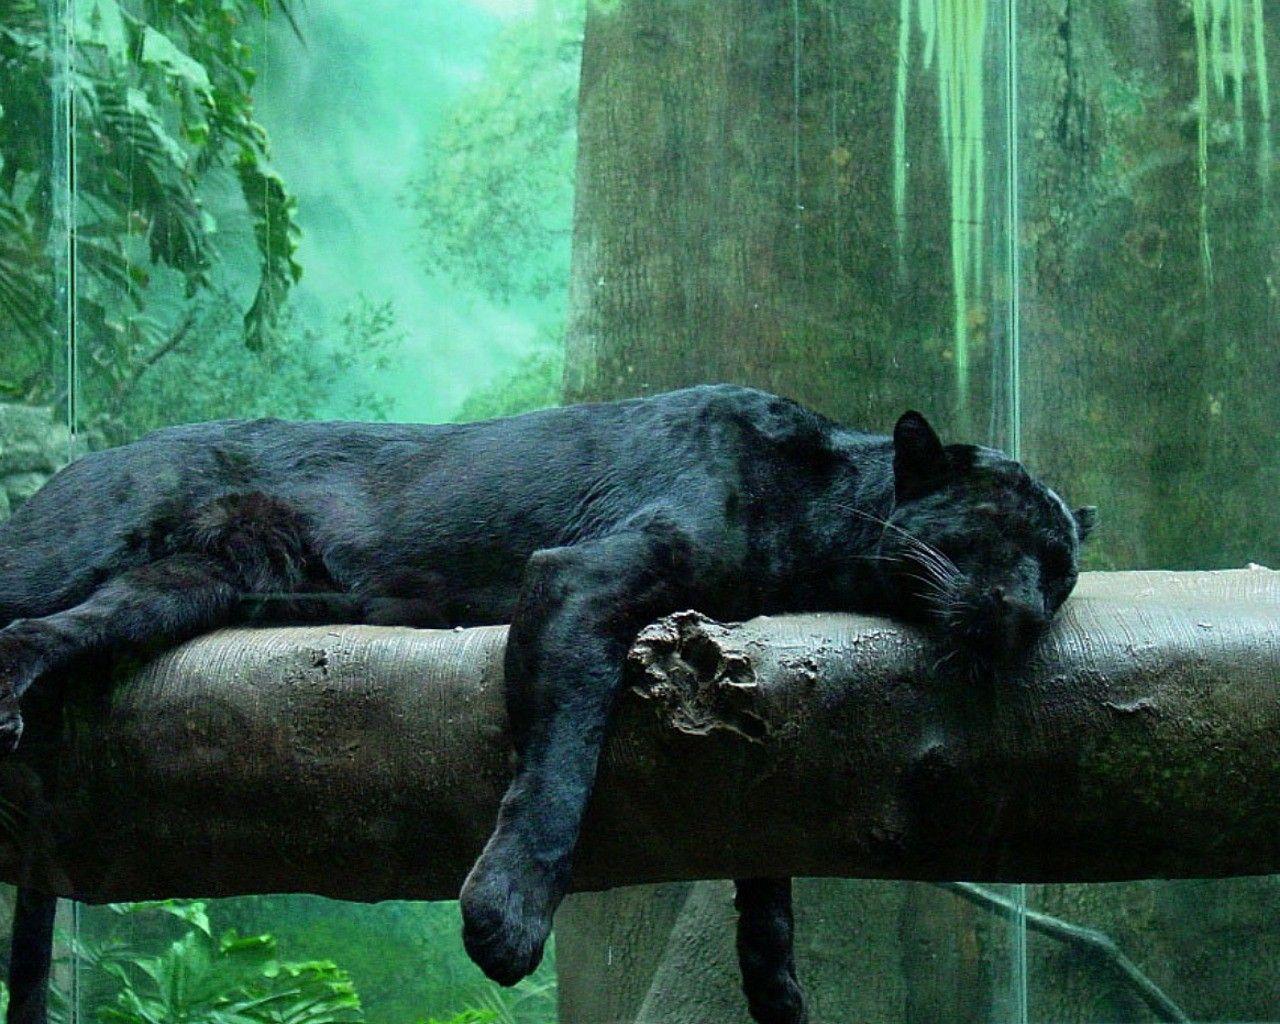 Black Panther Animal Wallpapers: Cute Black Panther HD Wallpapers